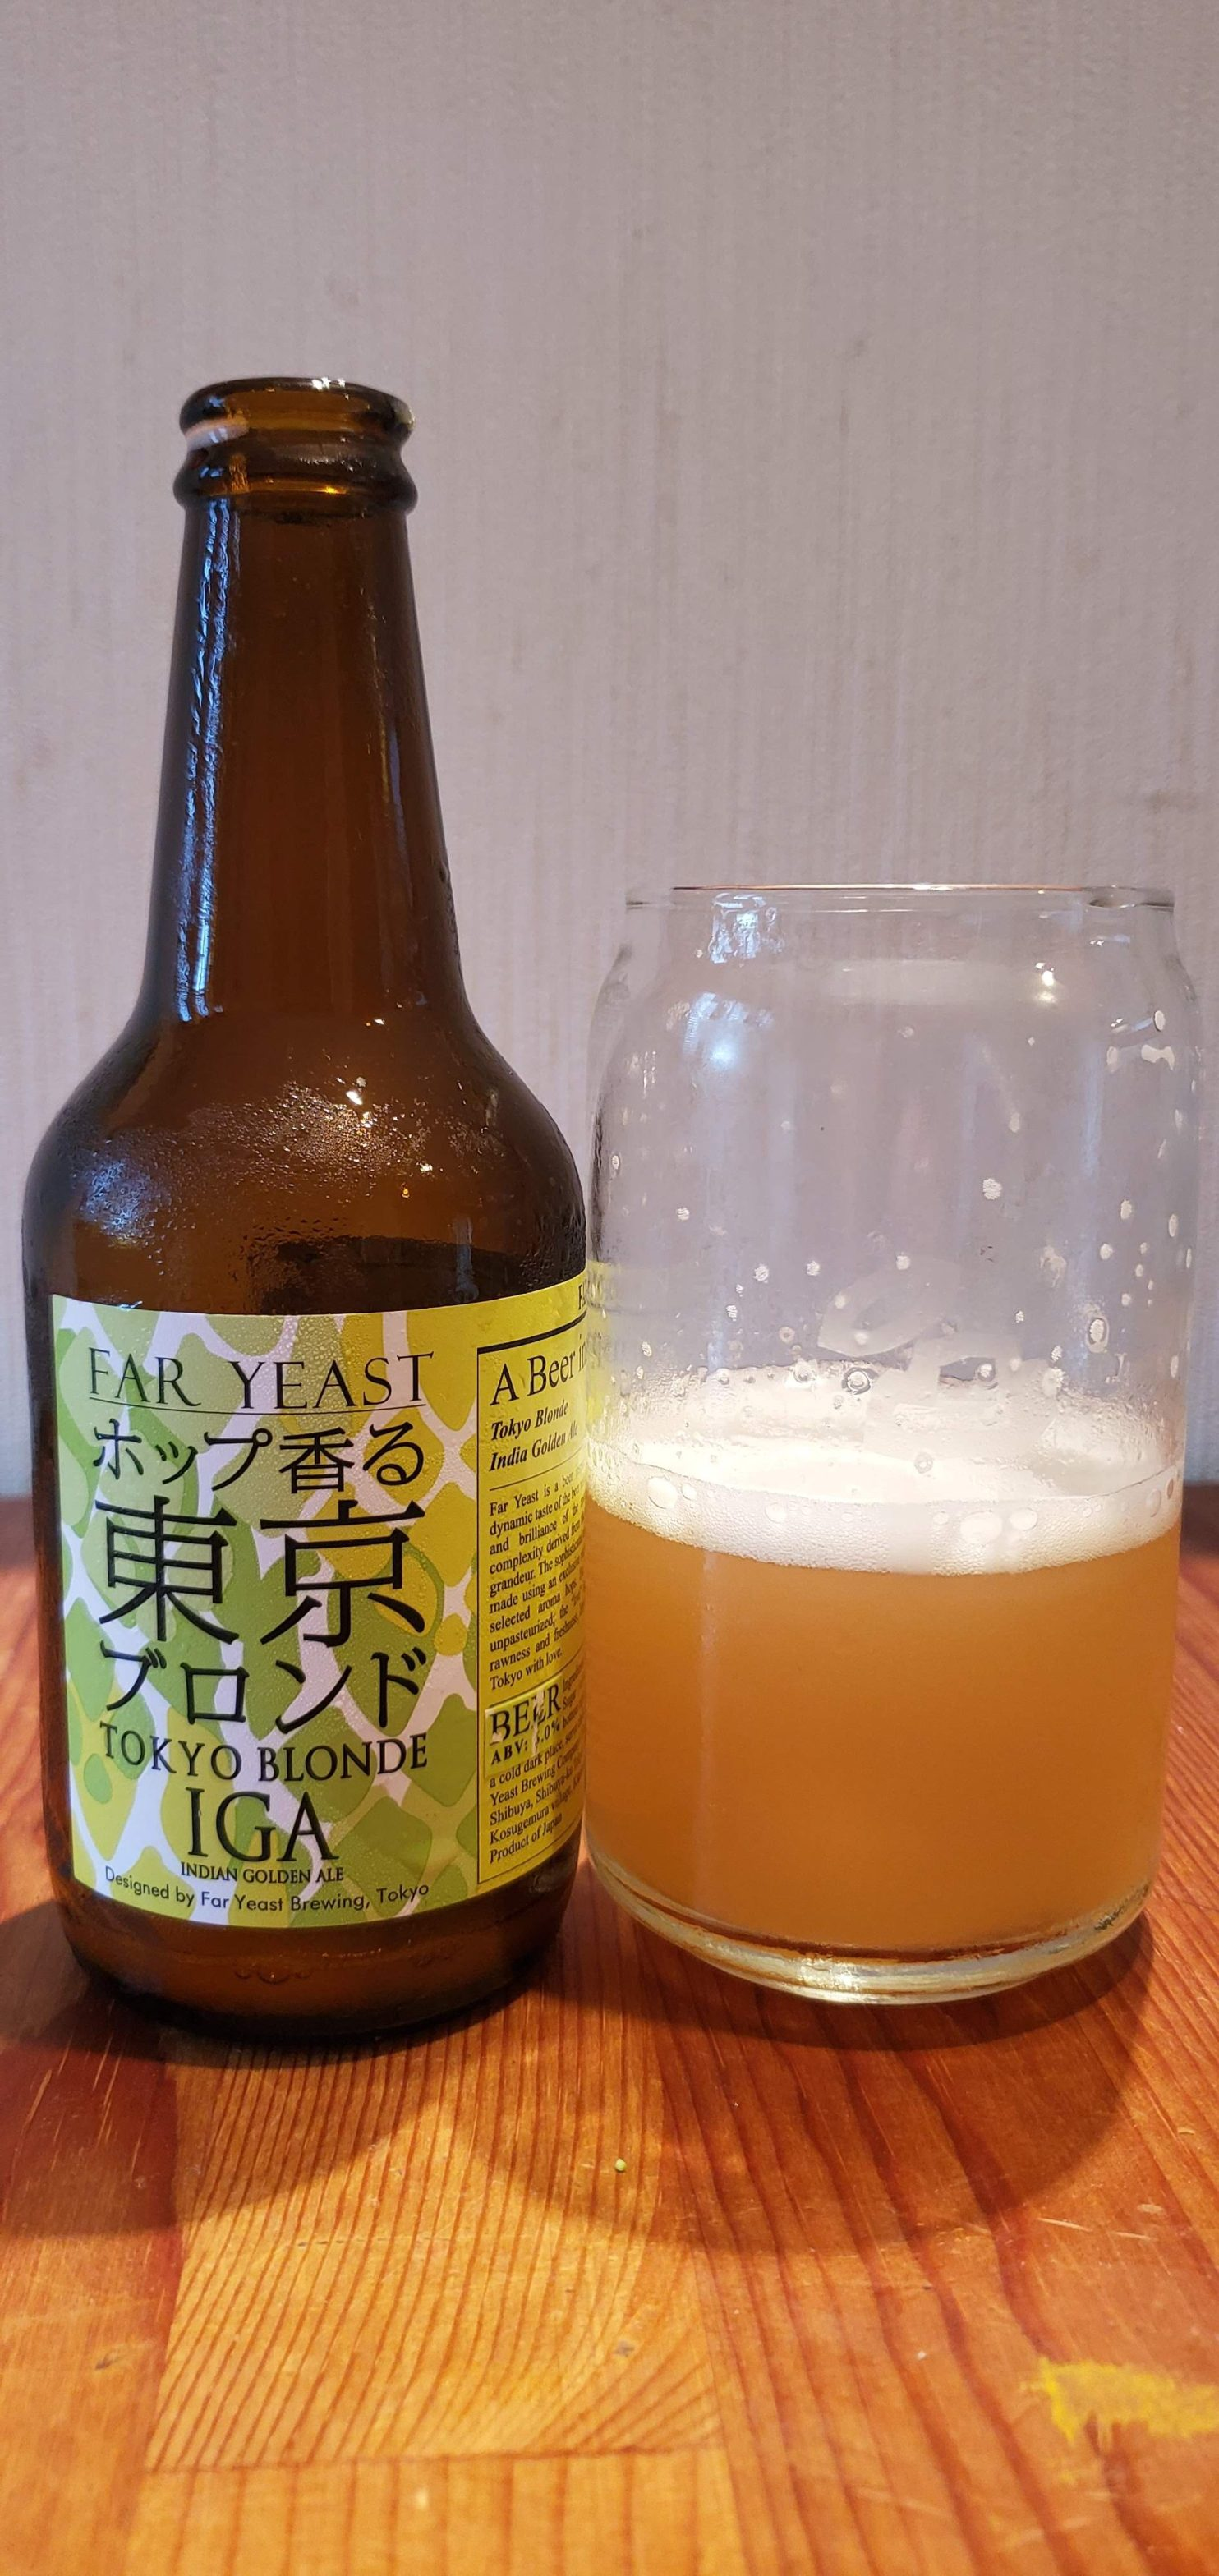 Far Yeast Tokyo Blonde IGA・ファーイーストホップ香る 東京ブロンド IGA